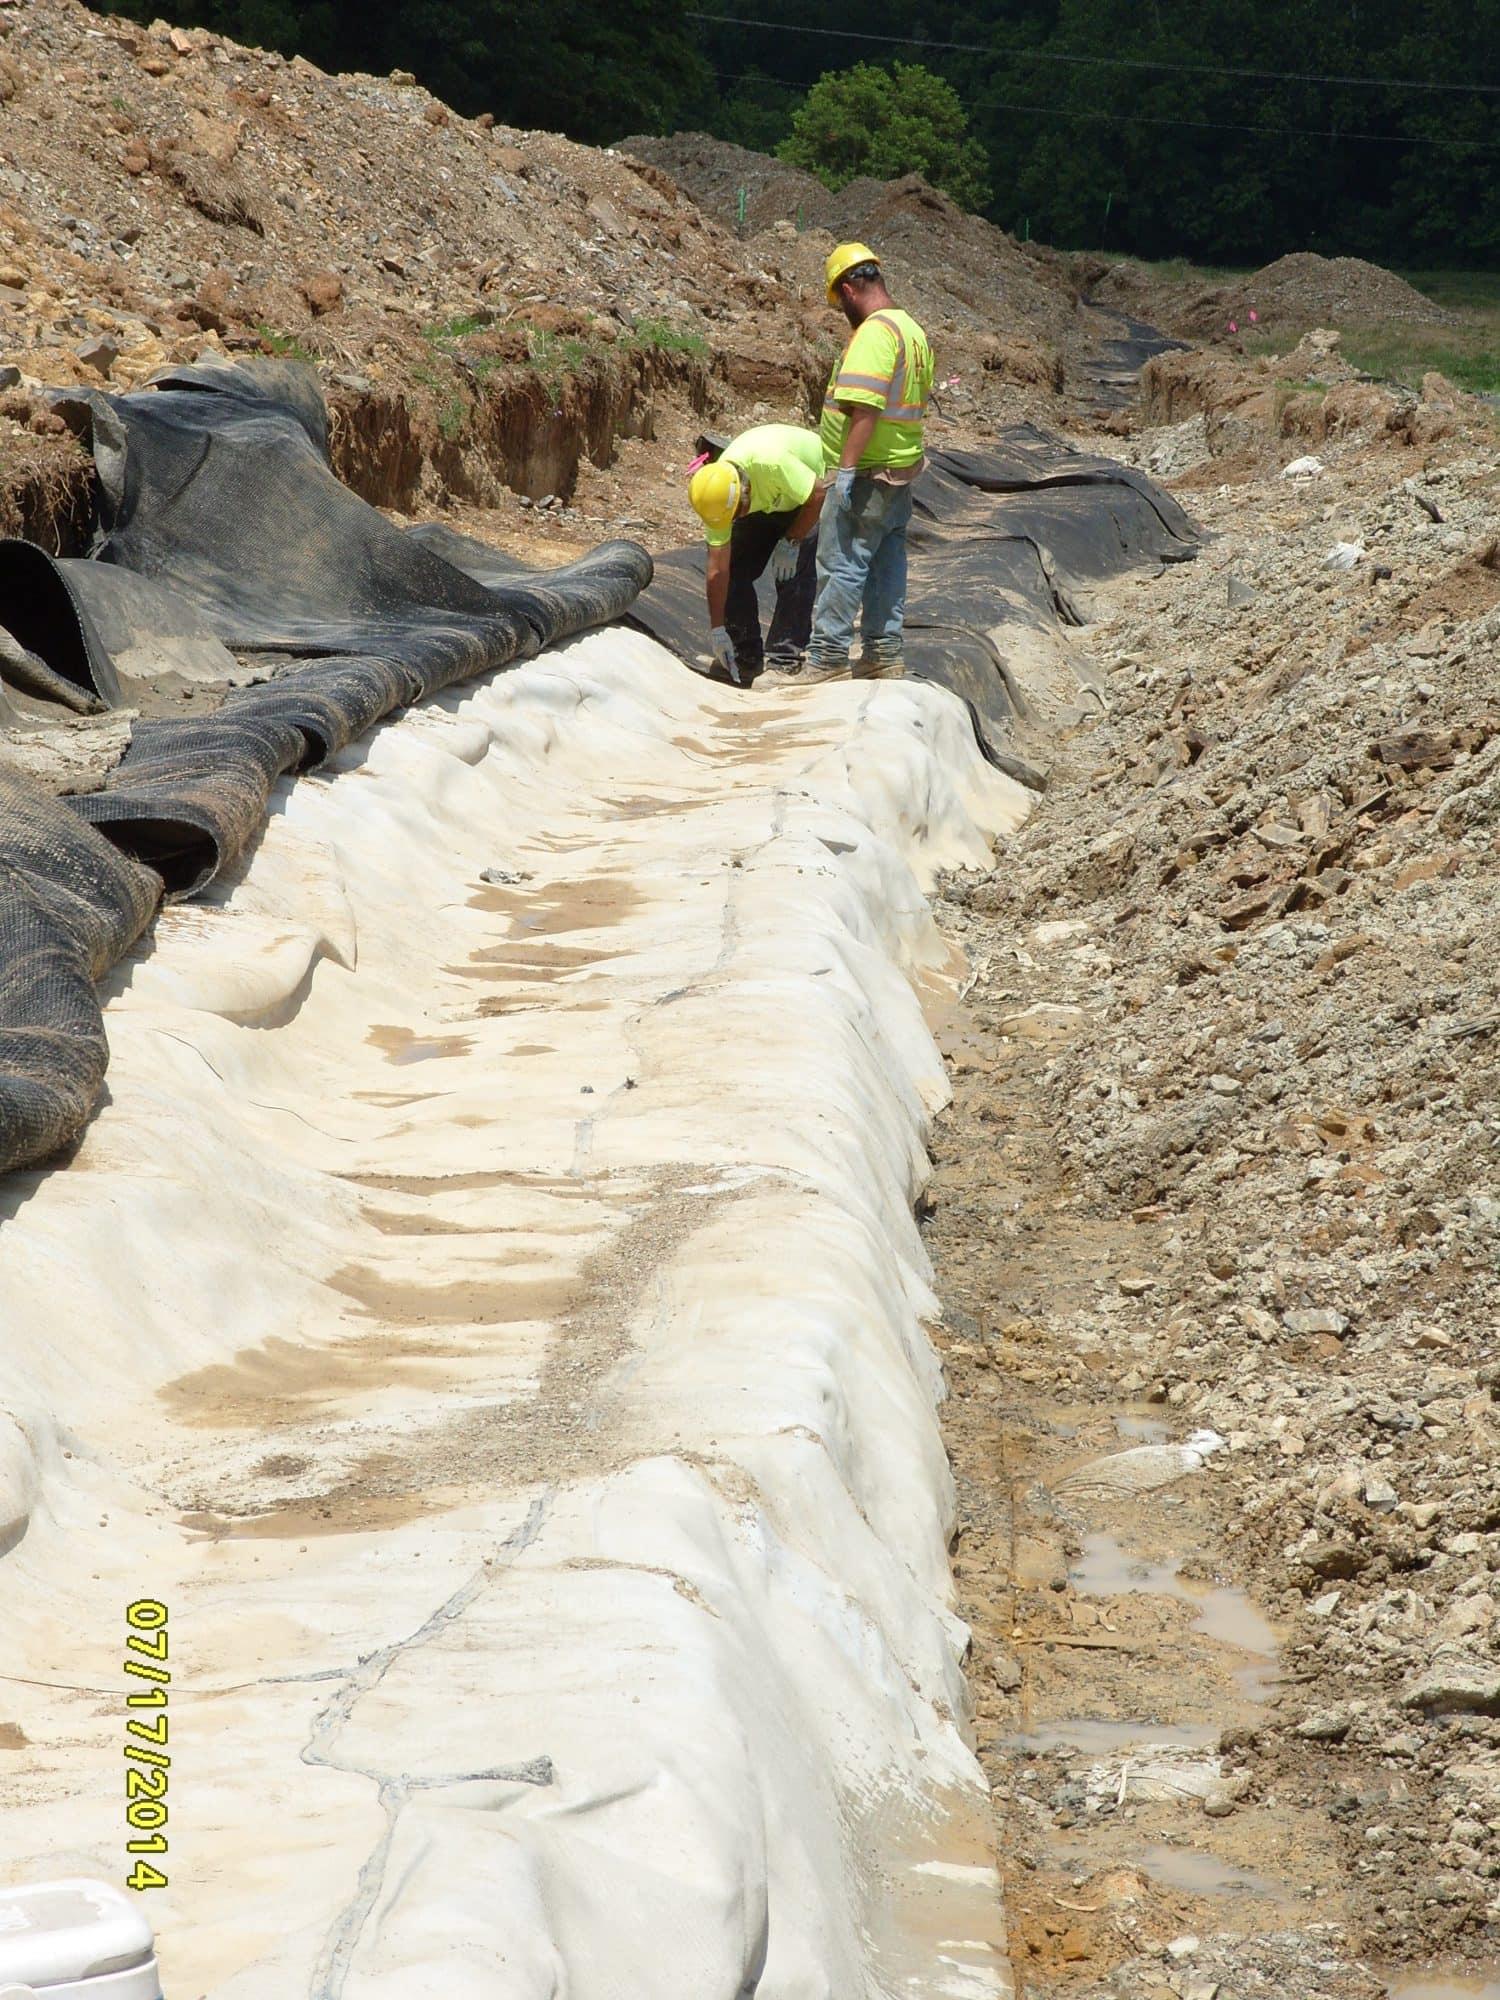 frederick co  landfill leachate lagoon  u0026 drainage